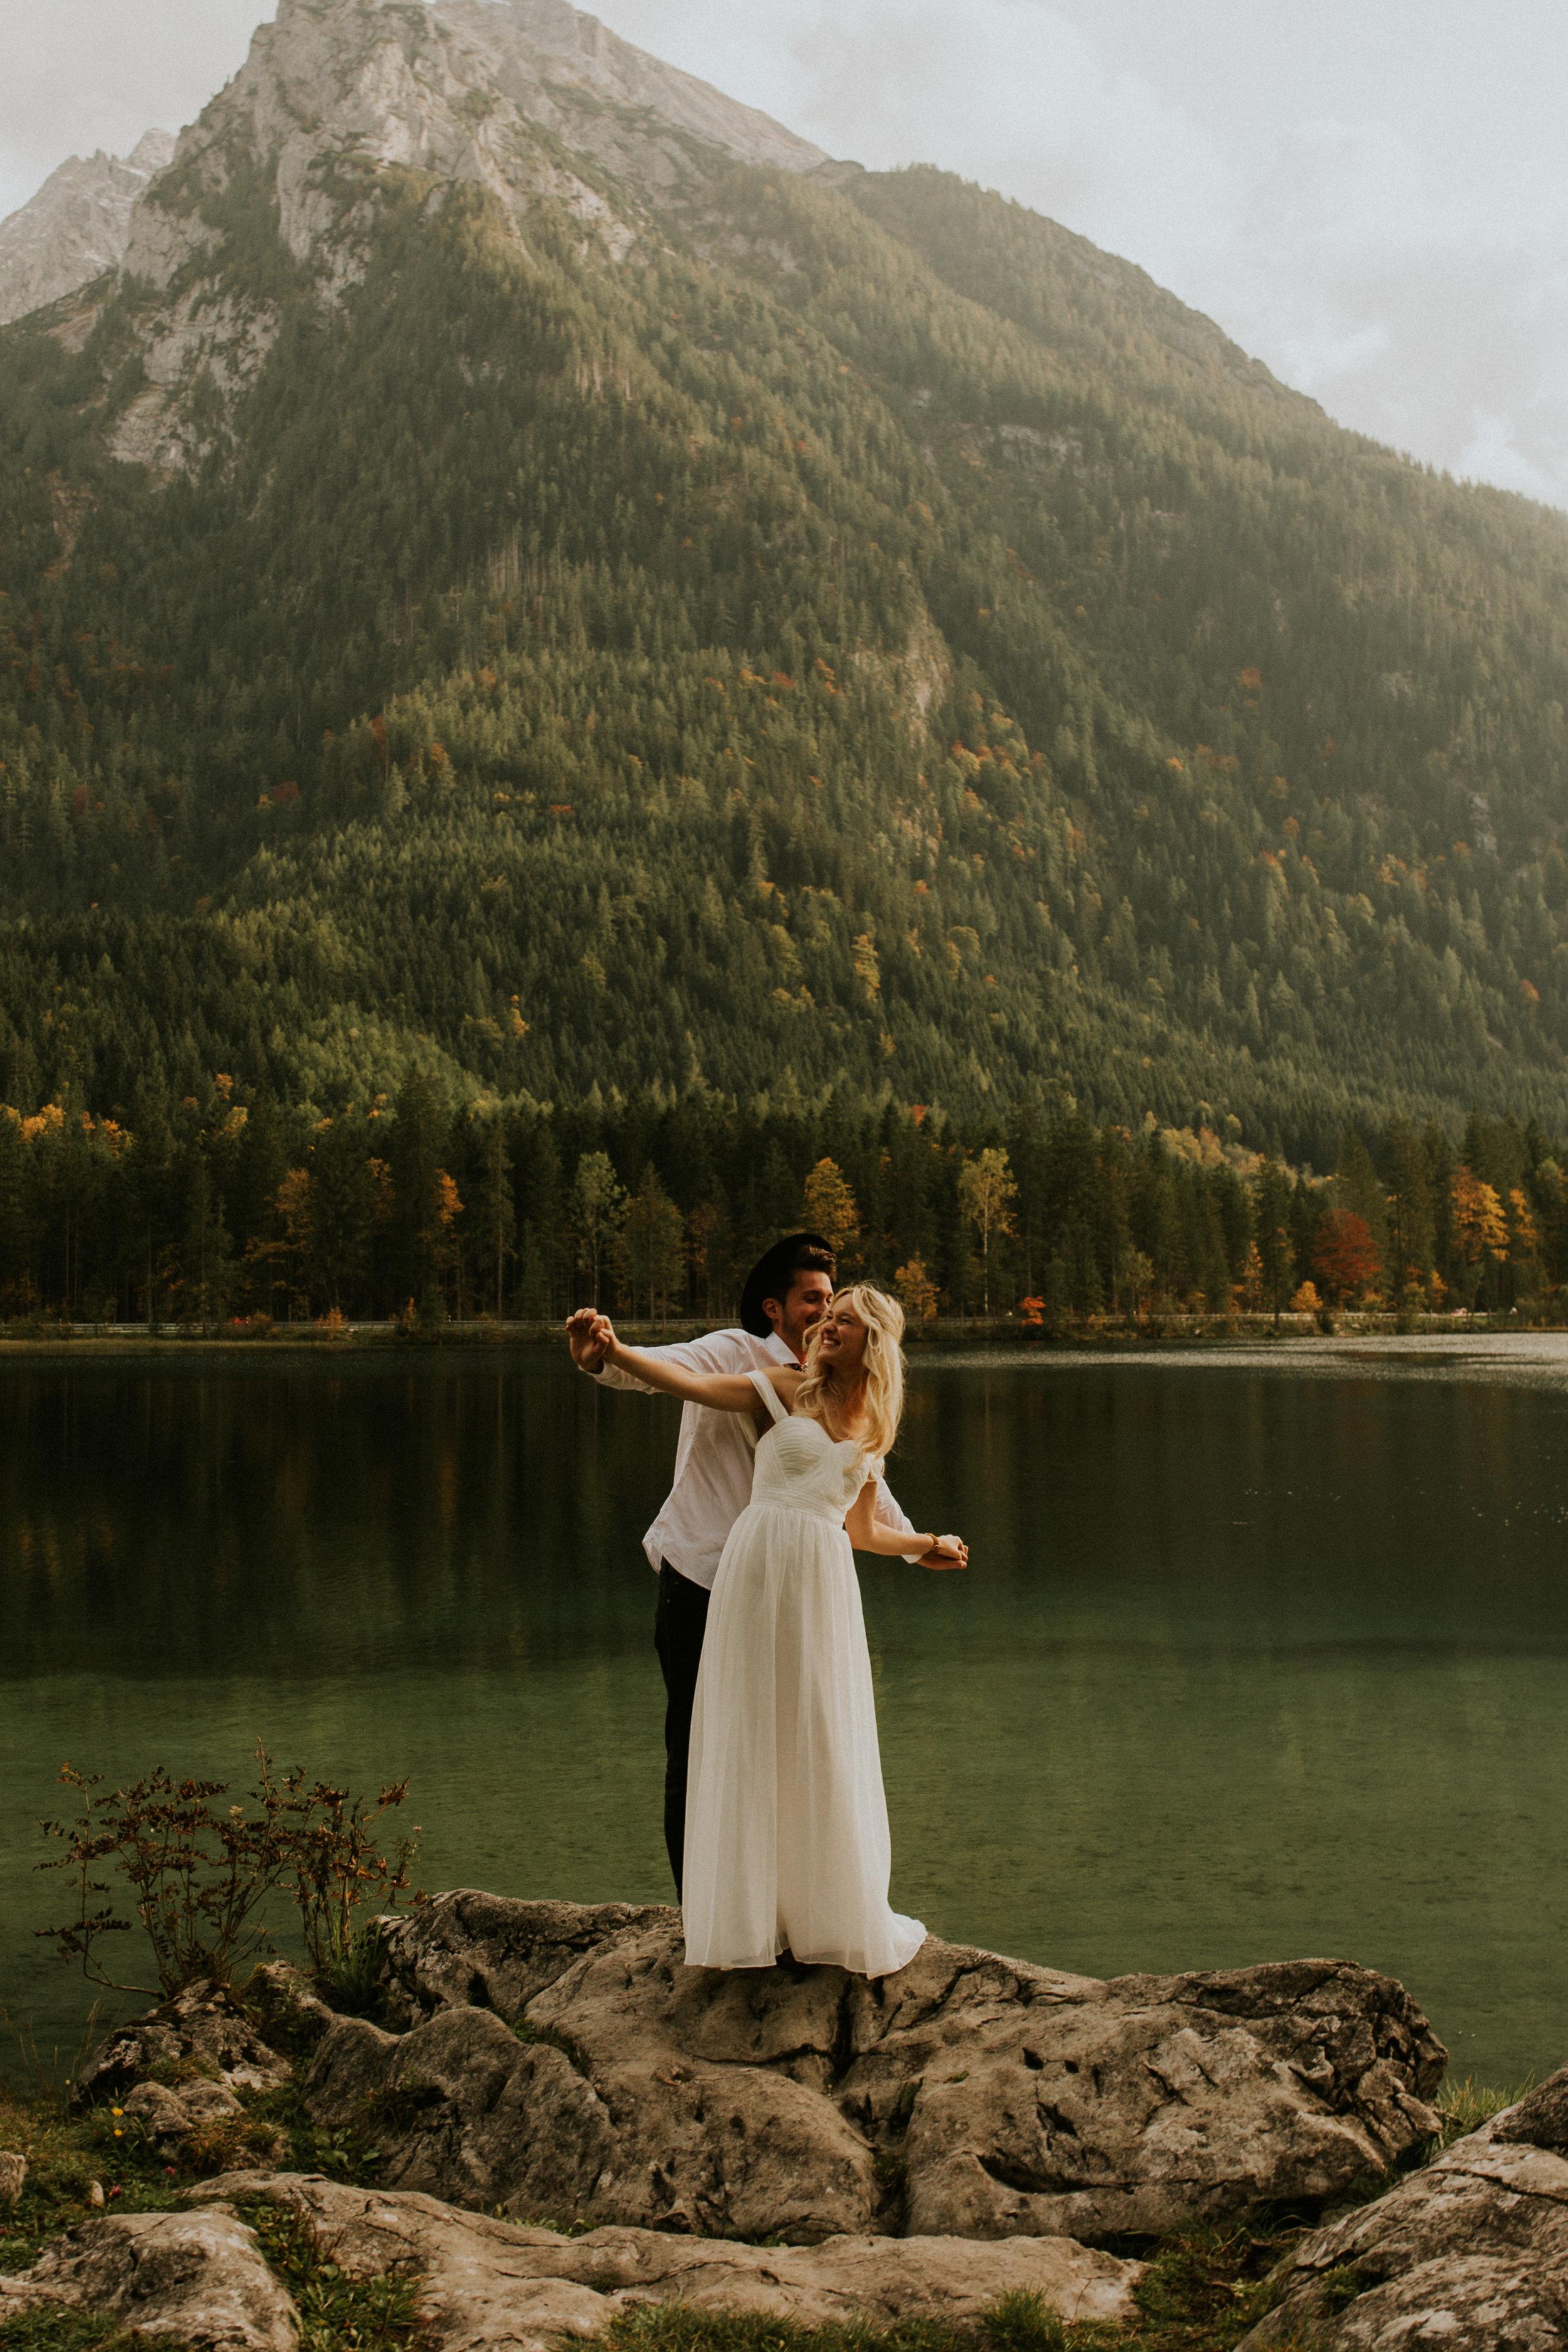 Best-Austria-hintersee-elopement-photography-breeanna-lasher